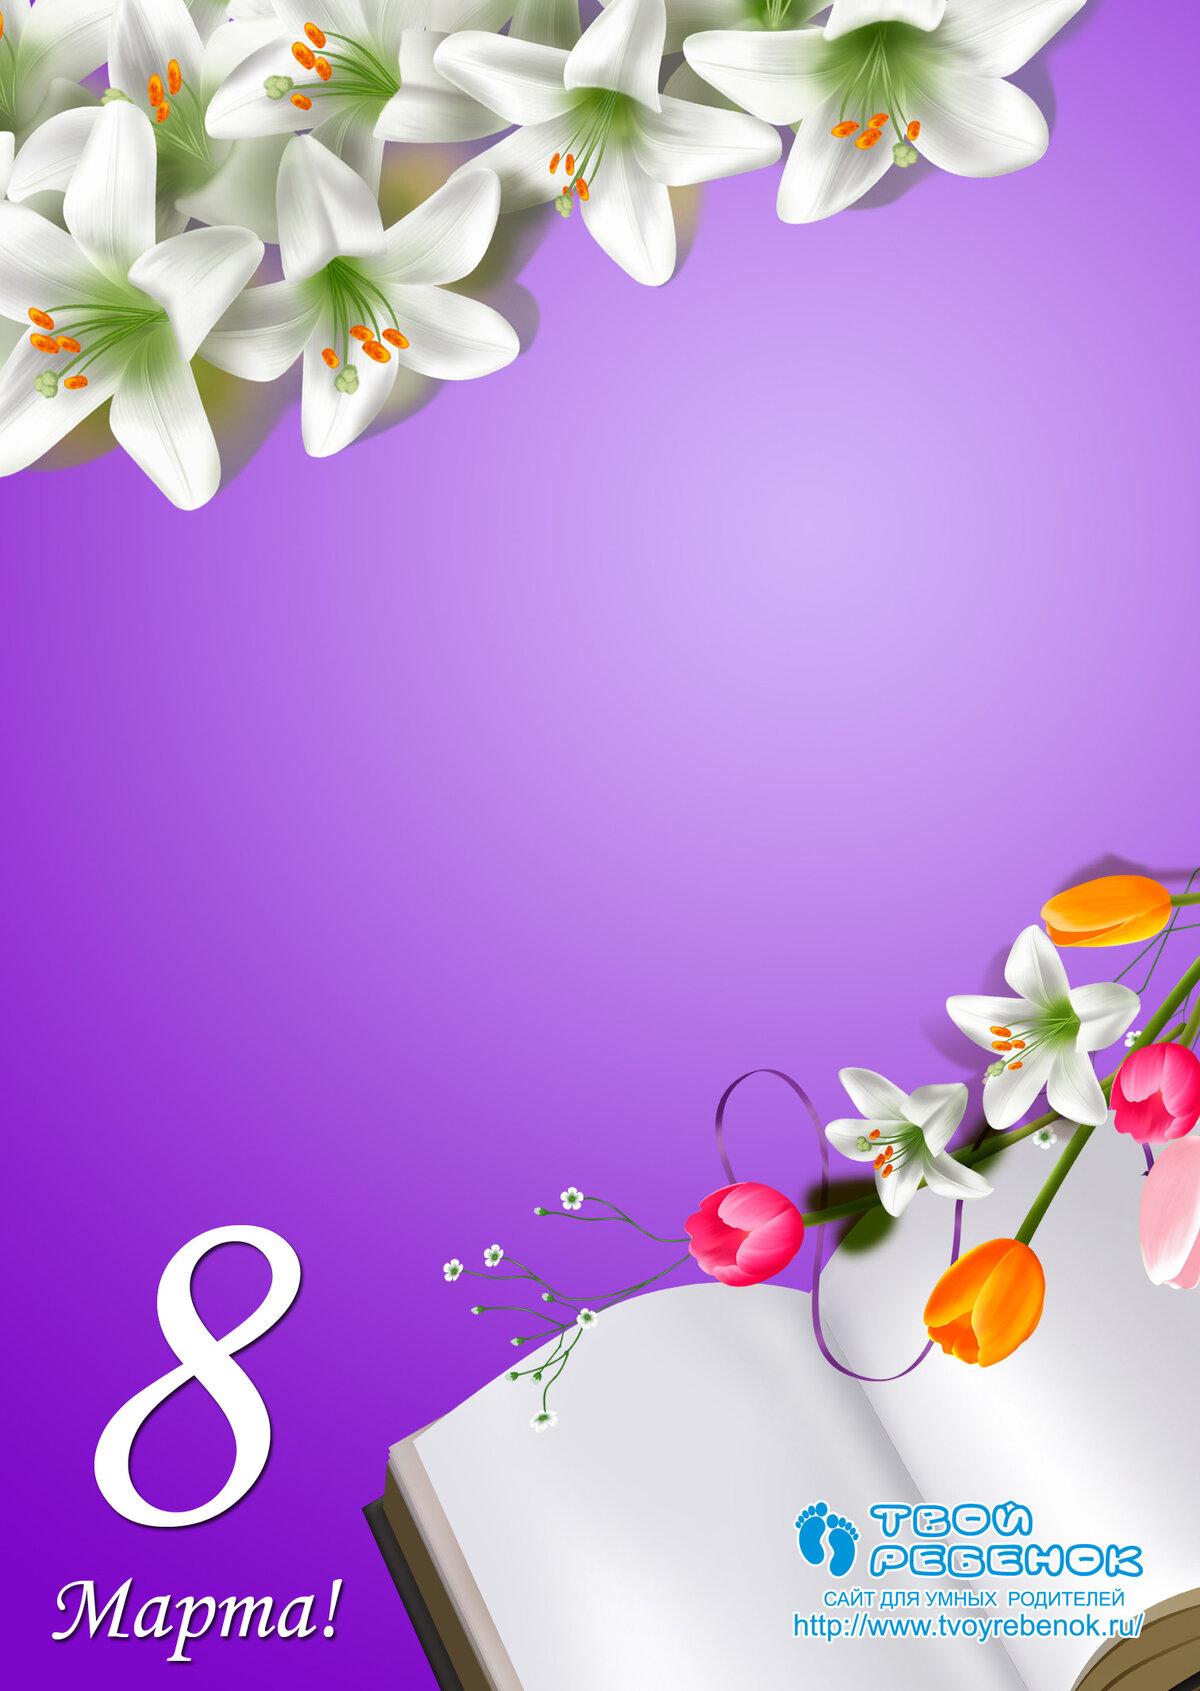 Днем рождения, картинки с 8 марта формат а4